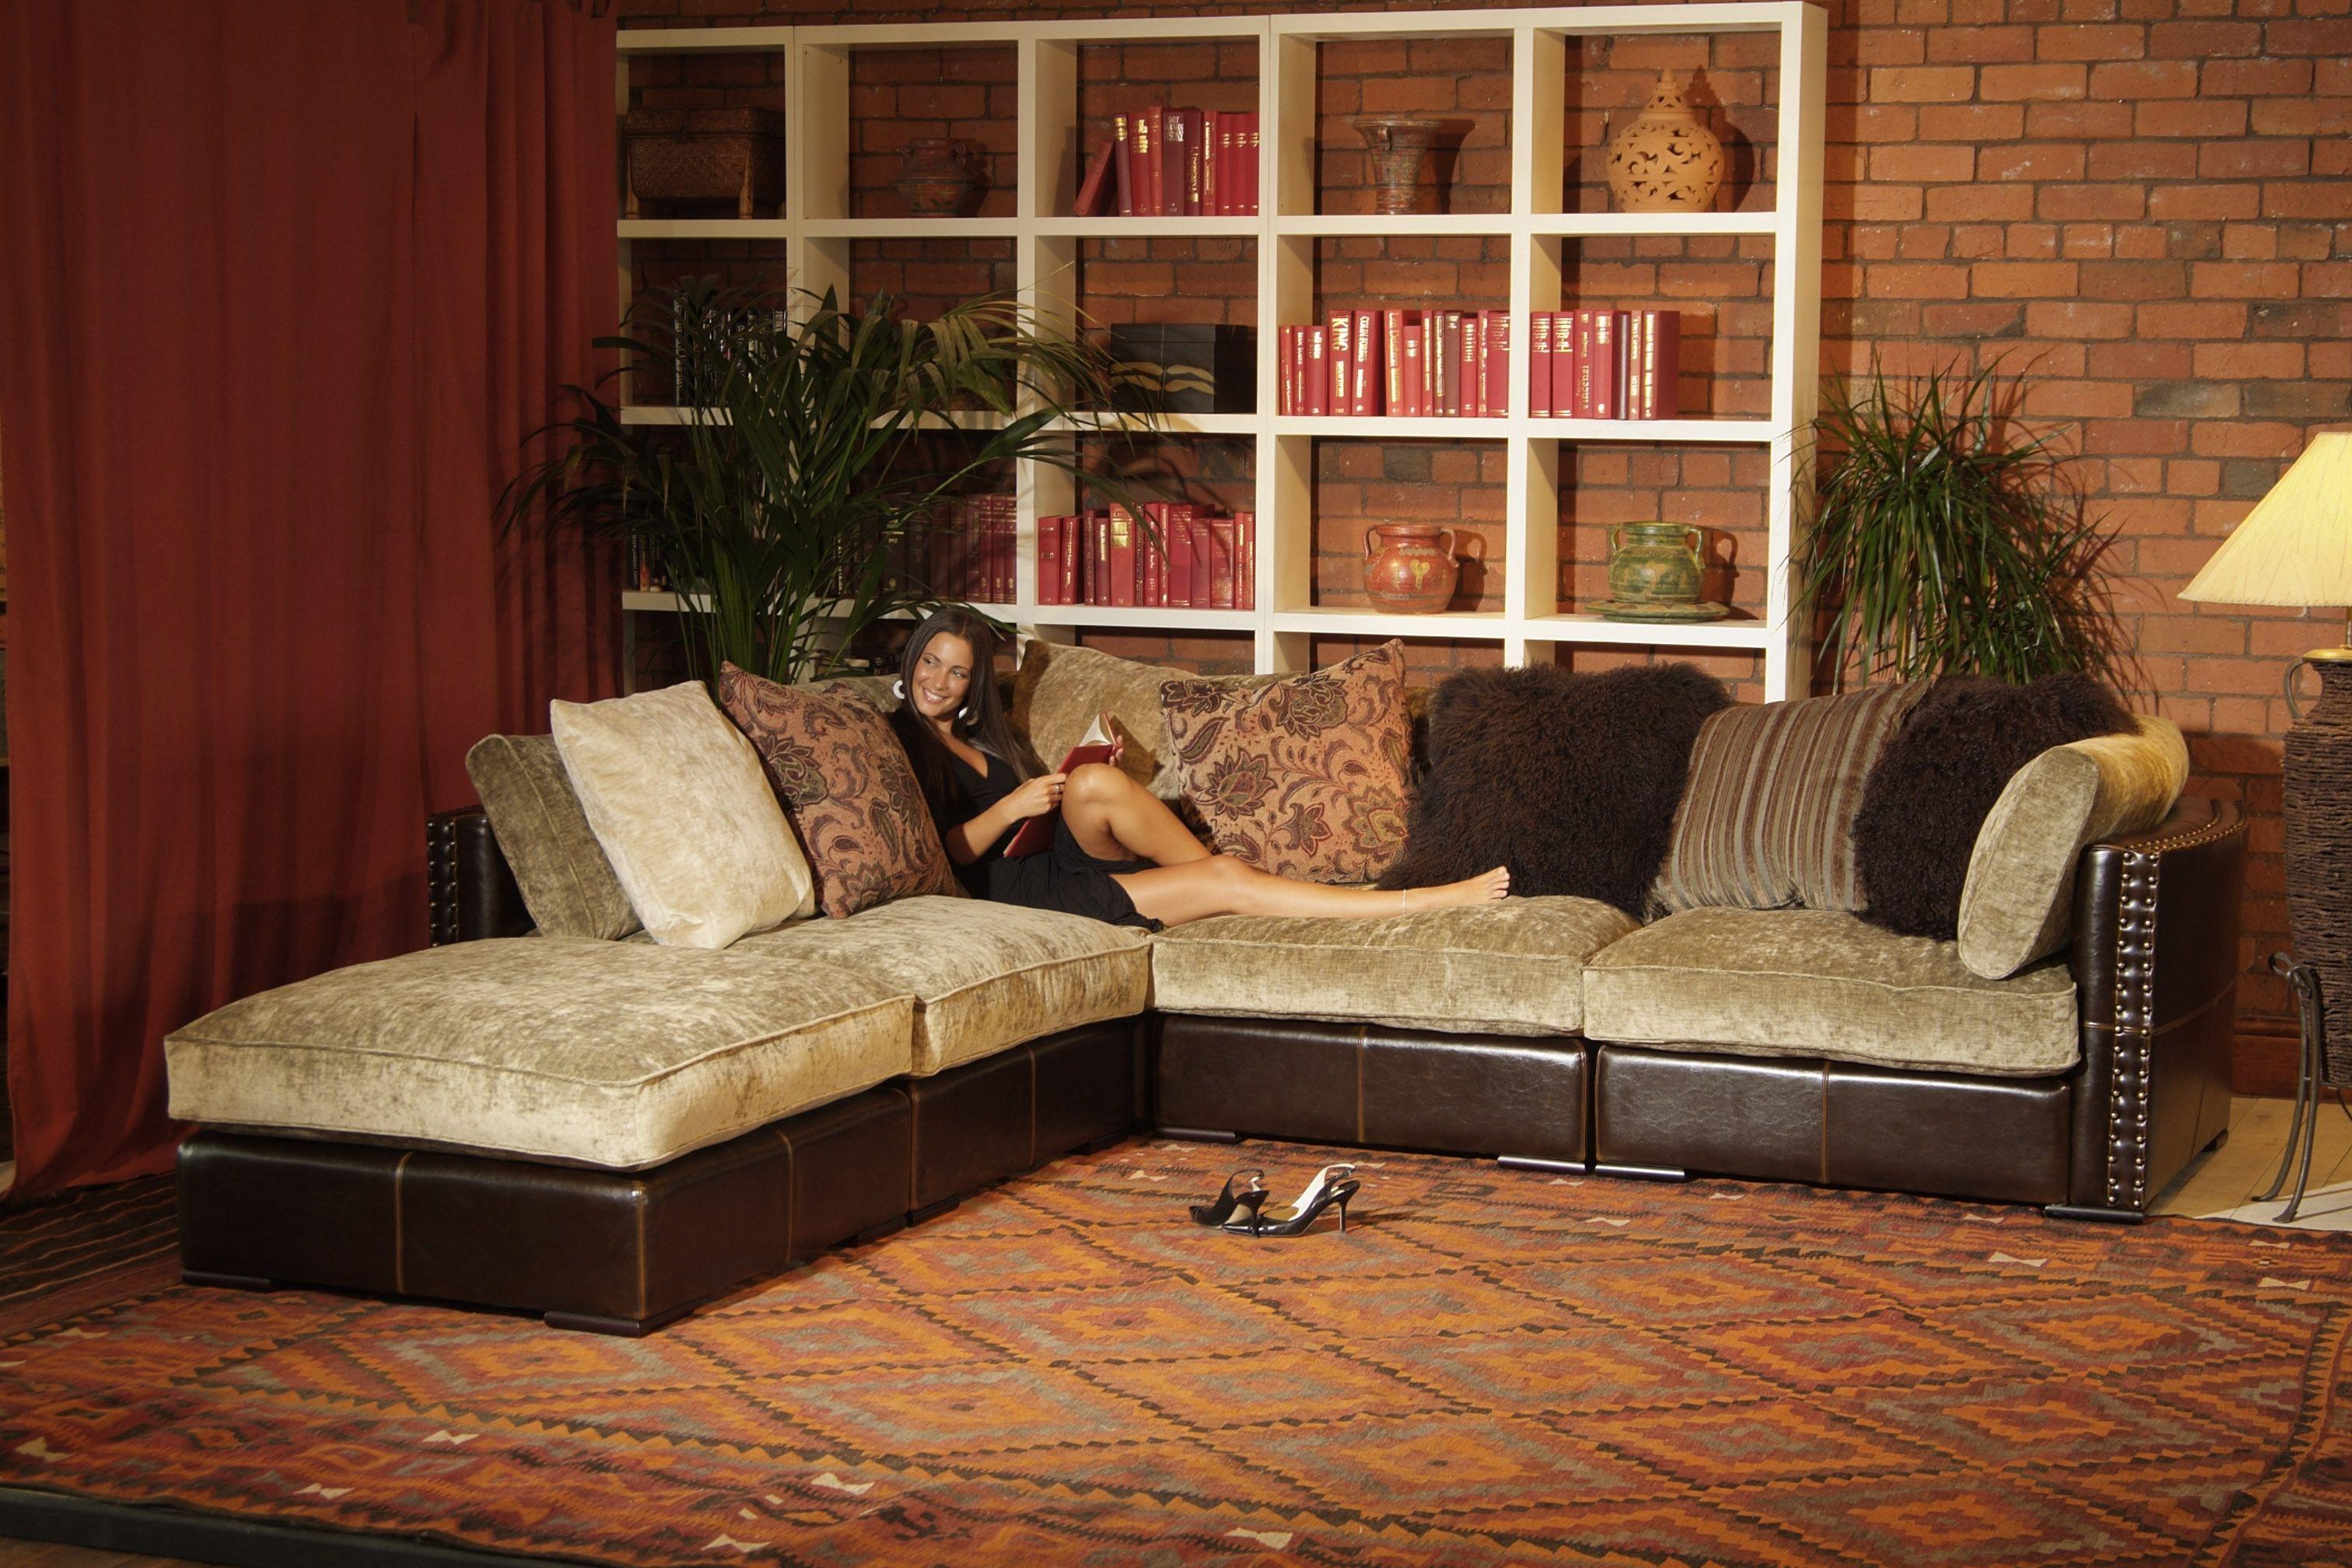 Infinity corner group sofa / global village | Furniture ...